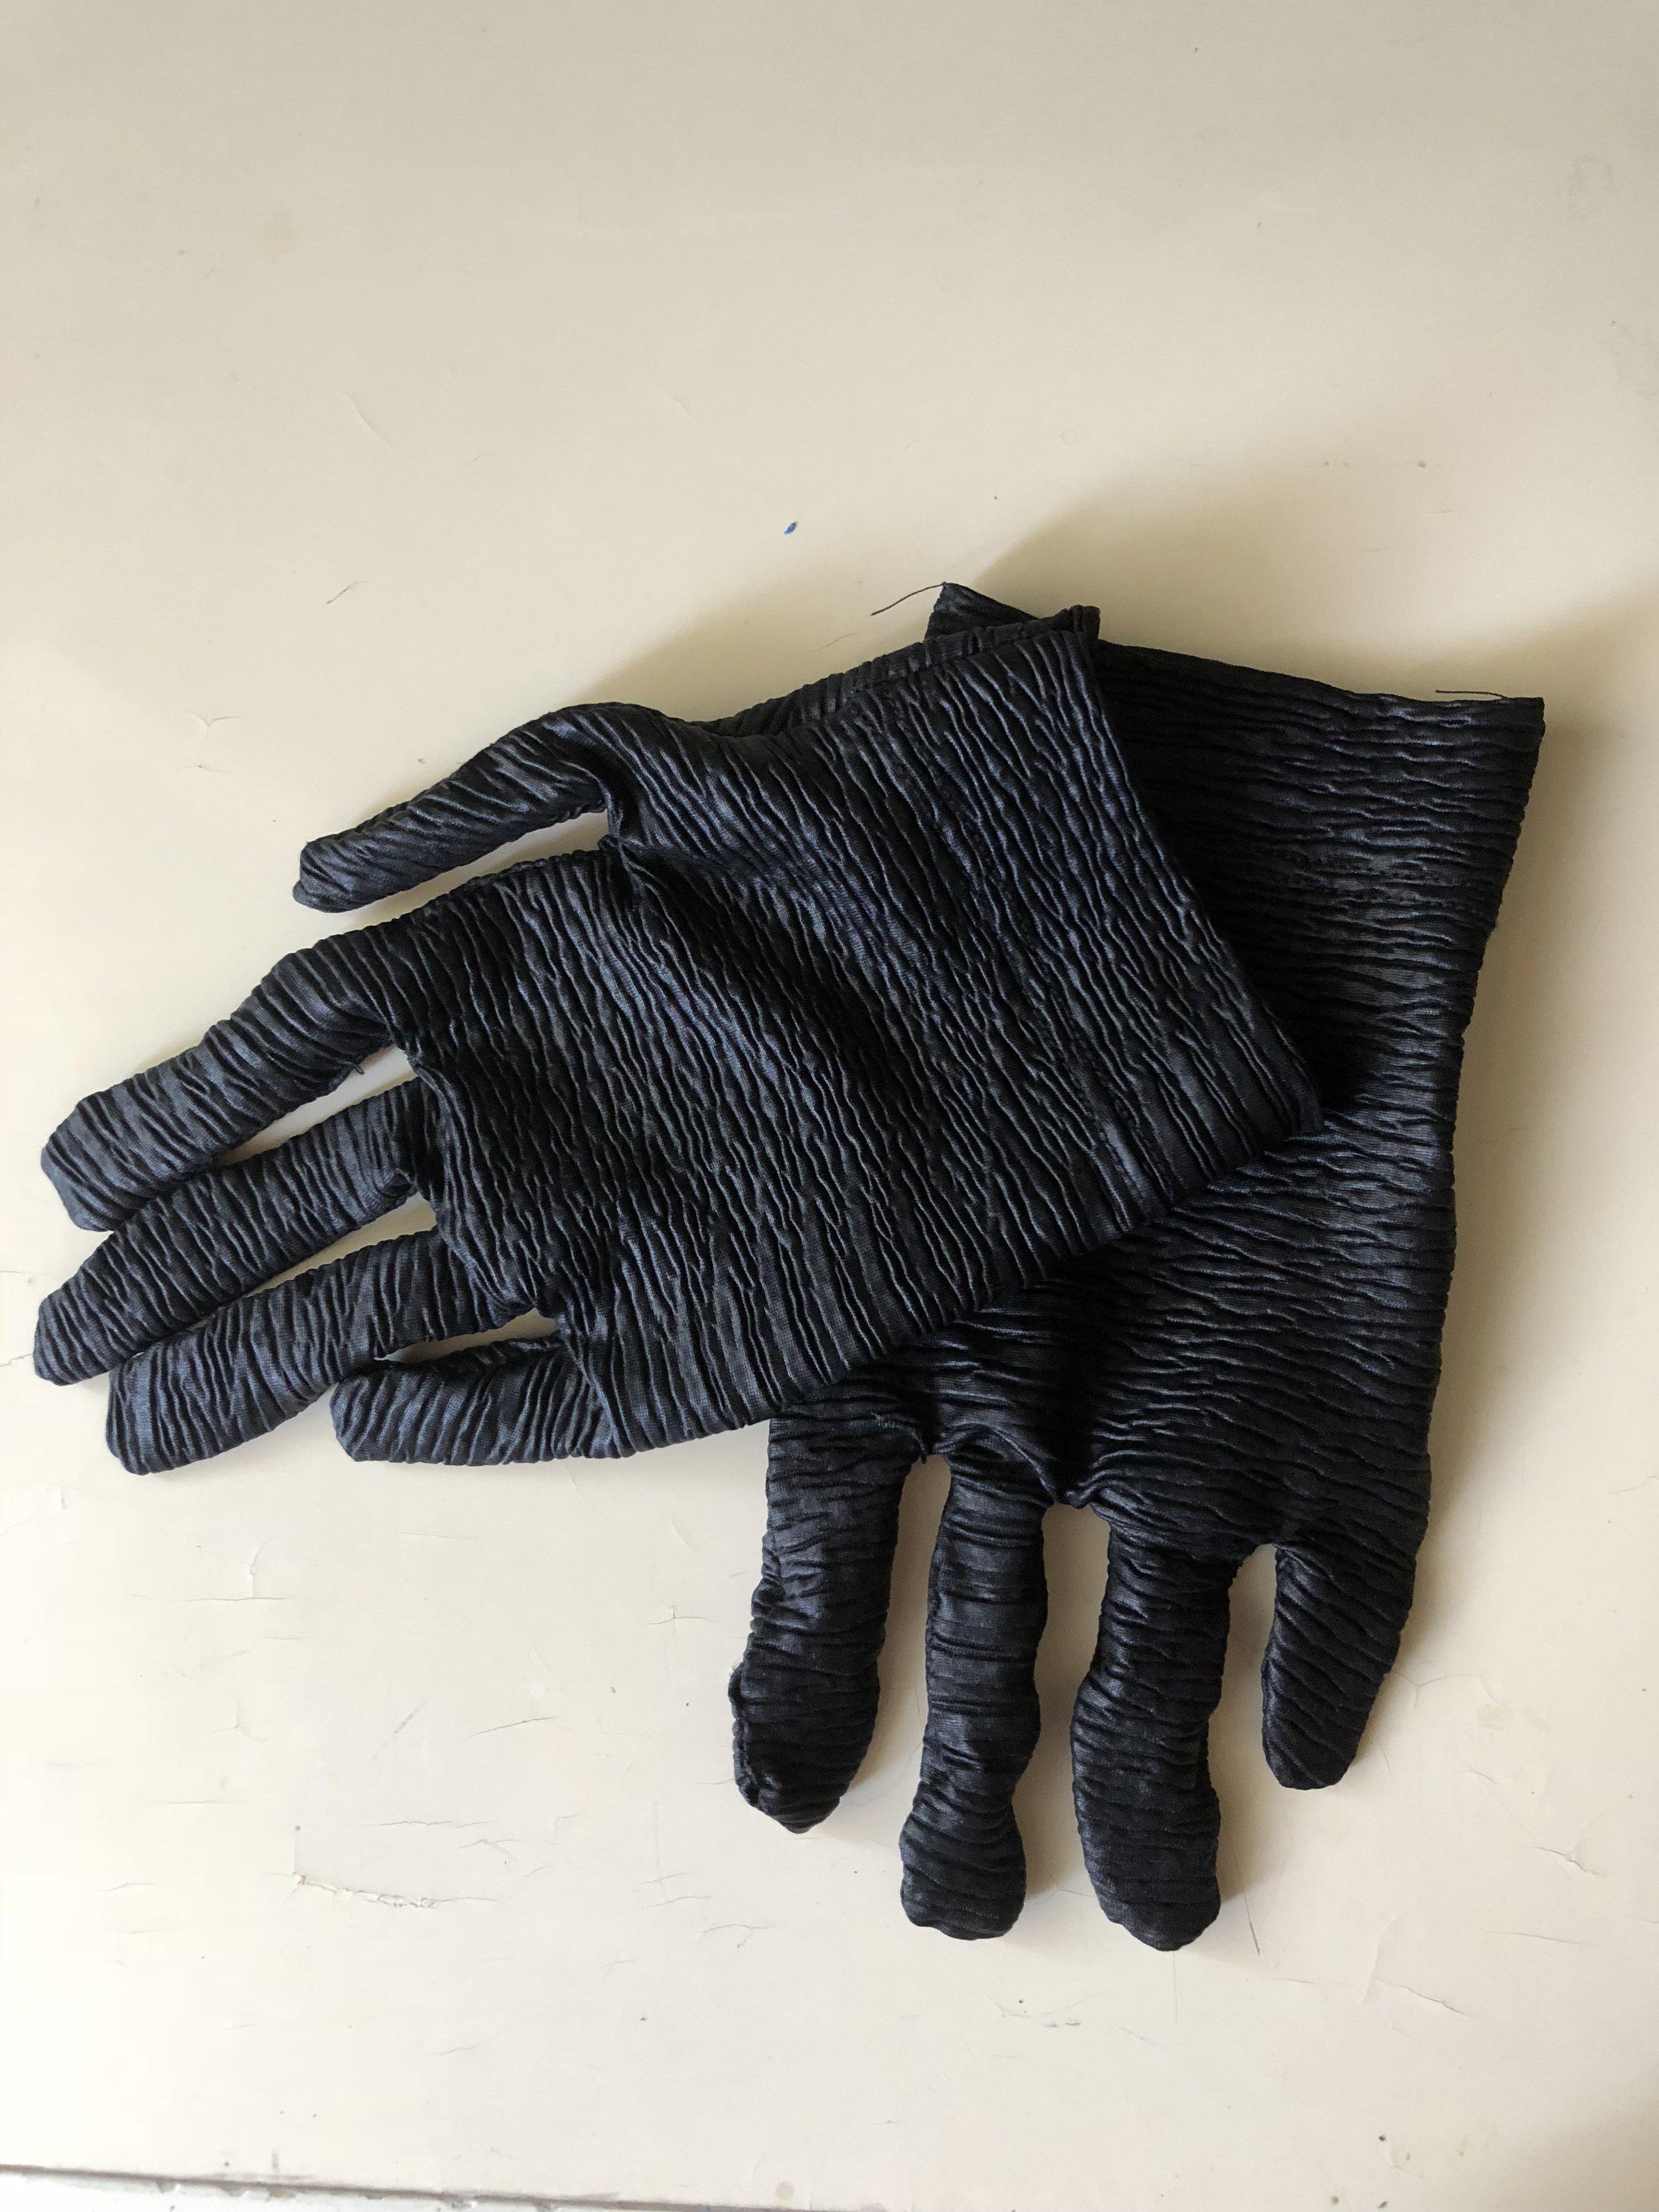 GlovesFinished.jpg